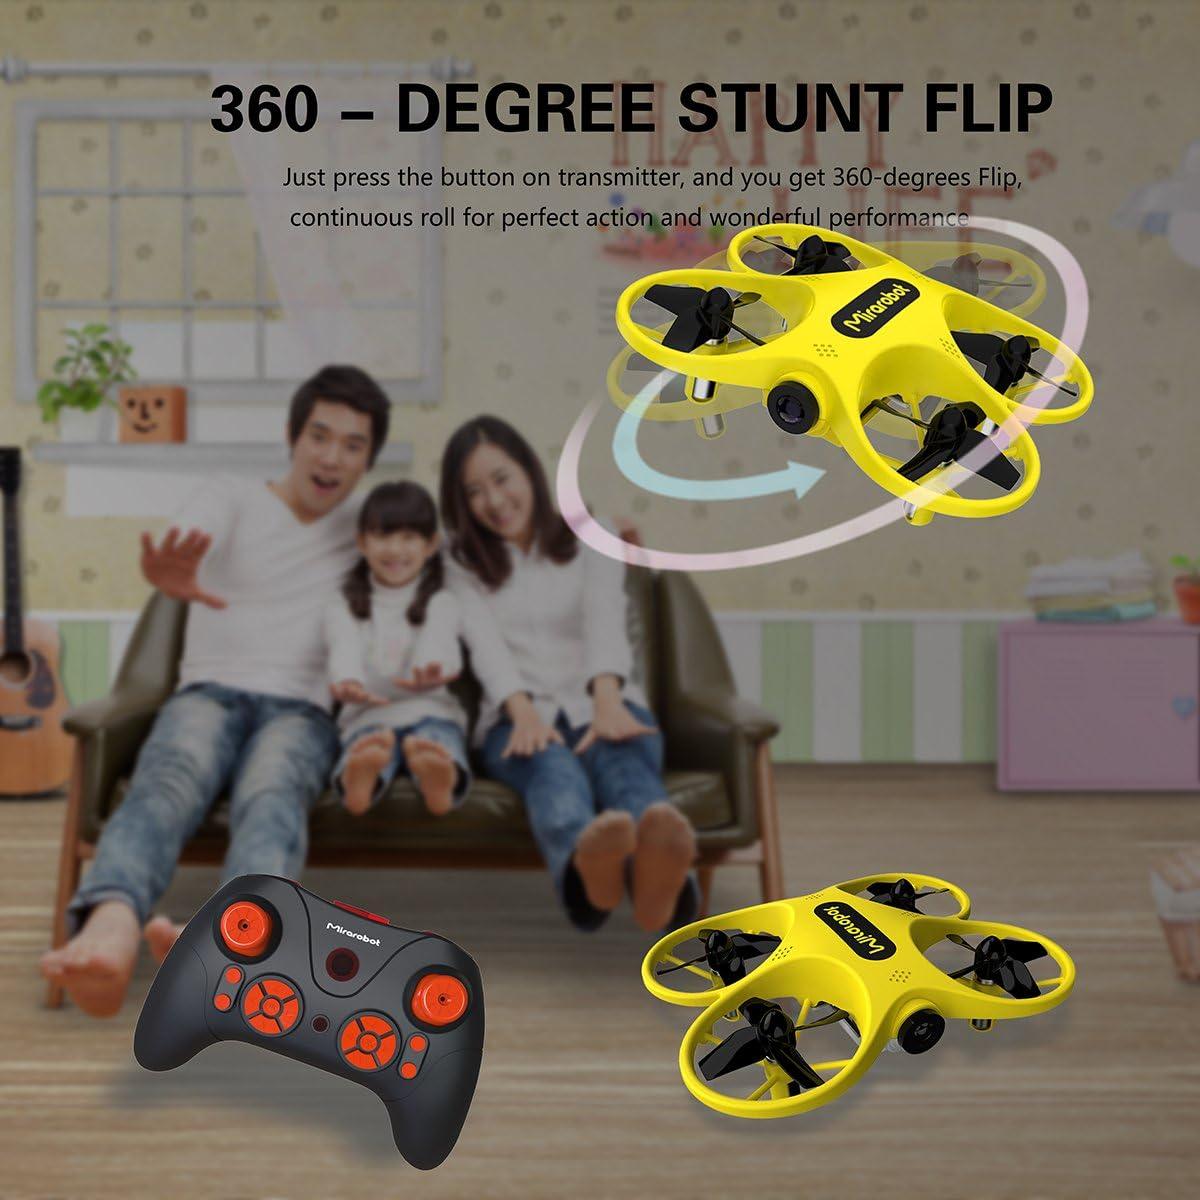 Ltd. Mirarobot S60 Drone Racing Micro Quadcopter Accessories Blade WuxiMirarobotScience/&TechnologyCo